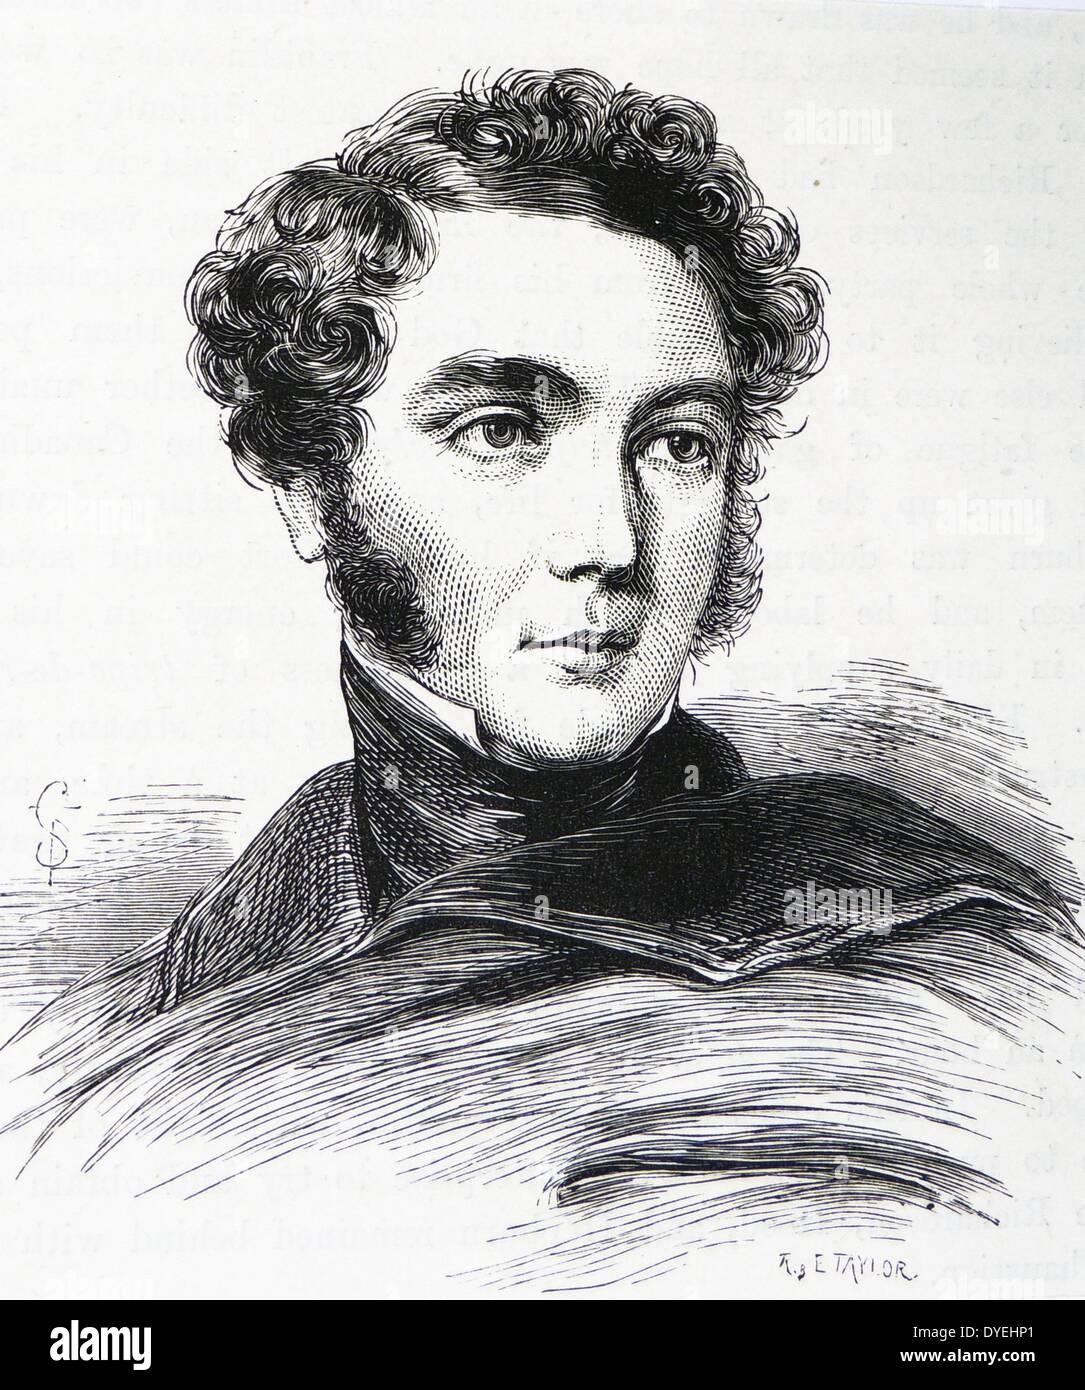 George Back British Arctic explorer and navigator - Stock Image